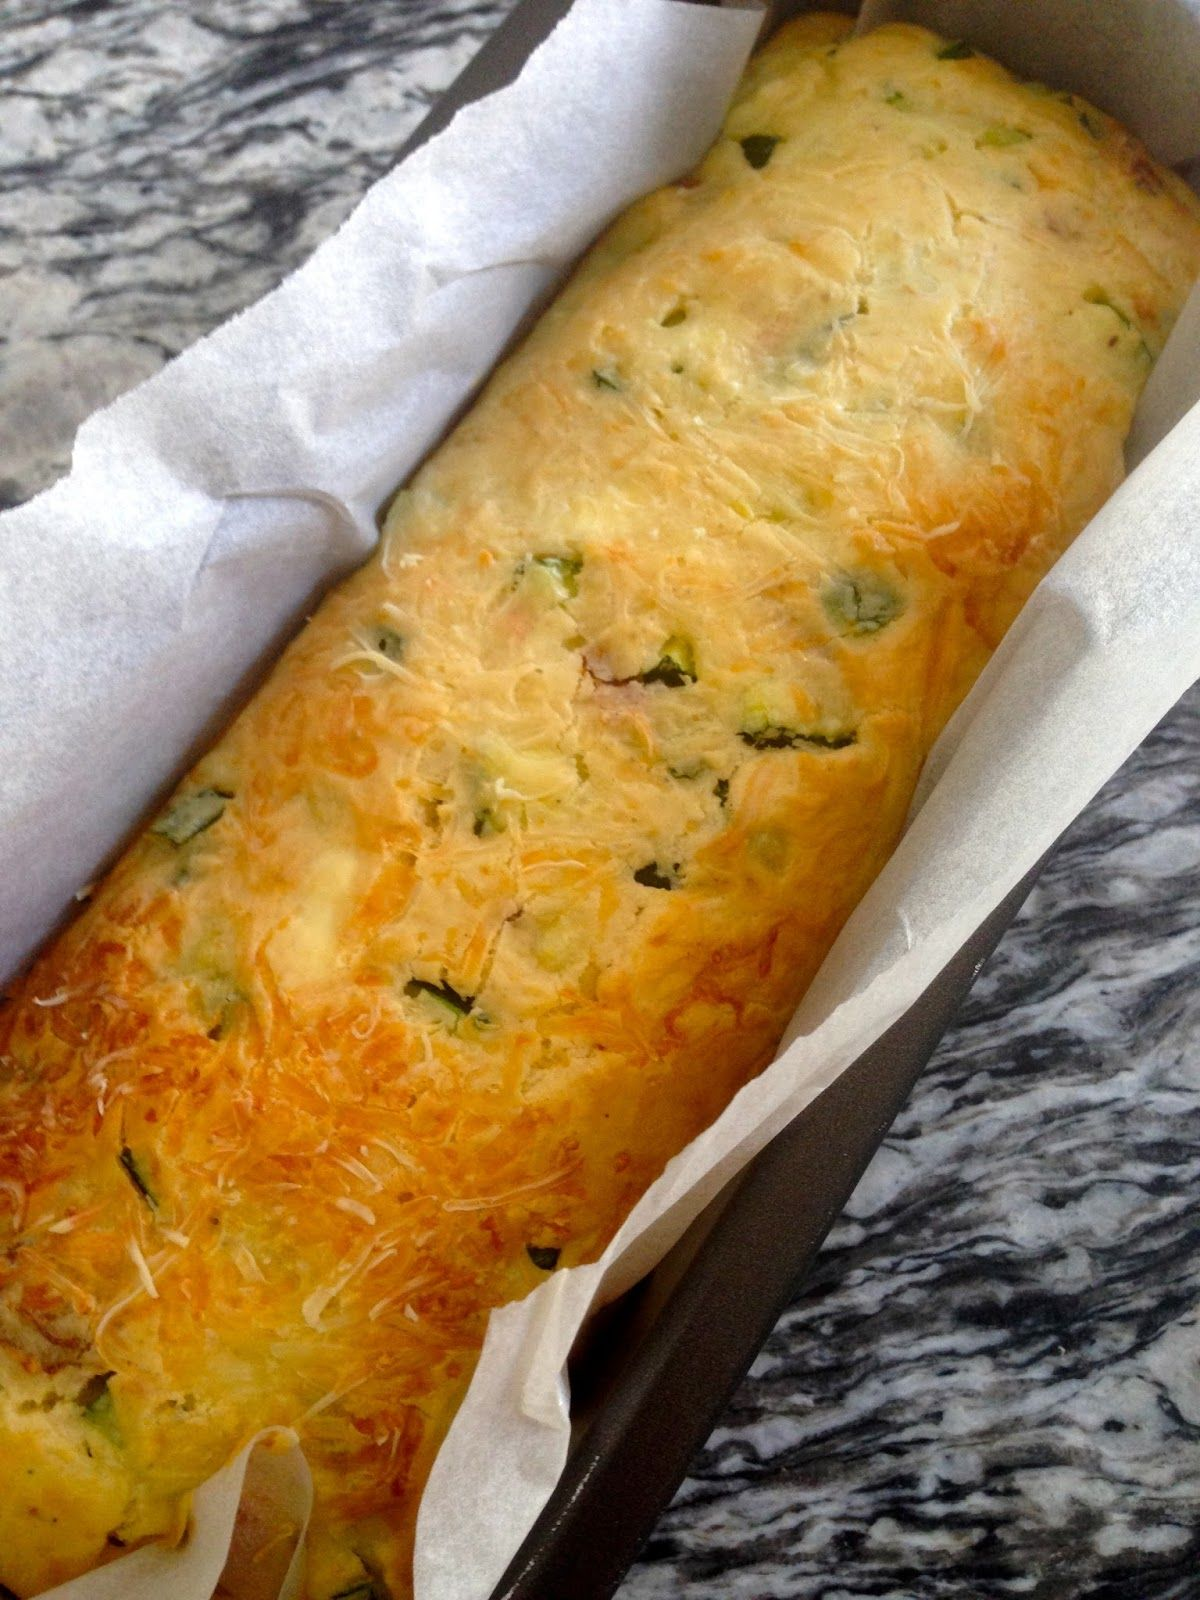 Savoury Cake made with fresh goat cheese, zucchini and sundried tomatoes